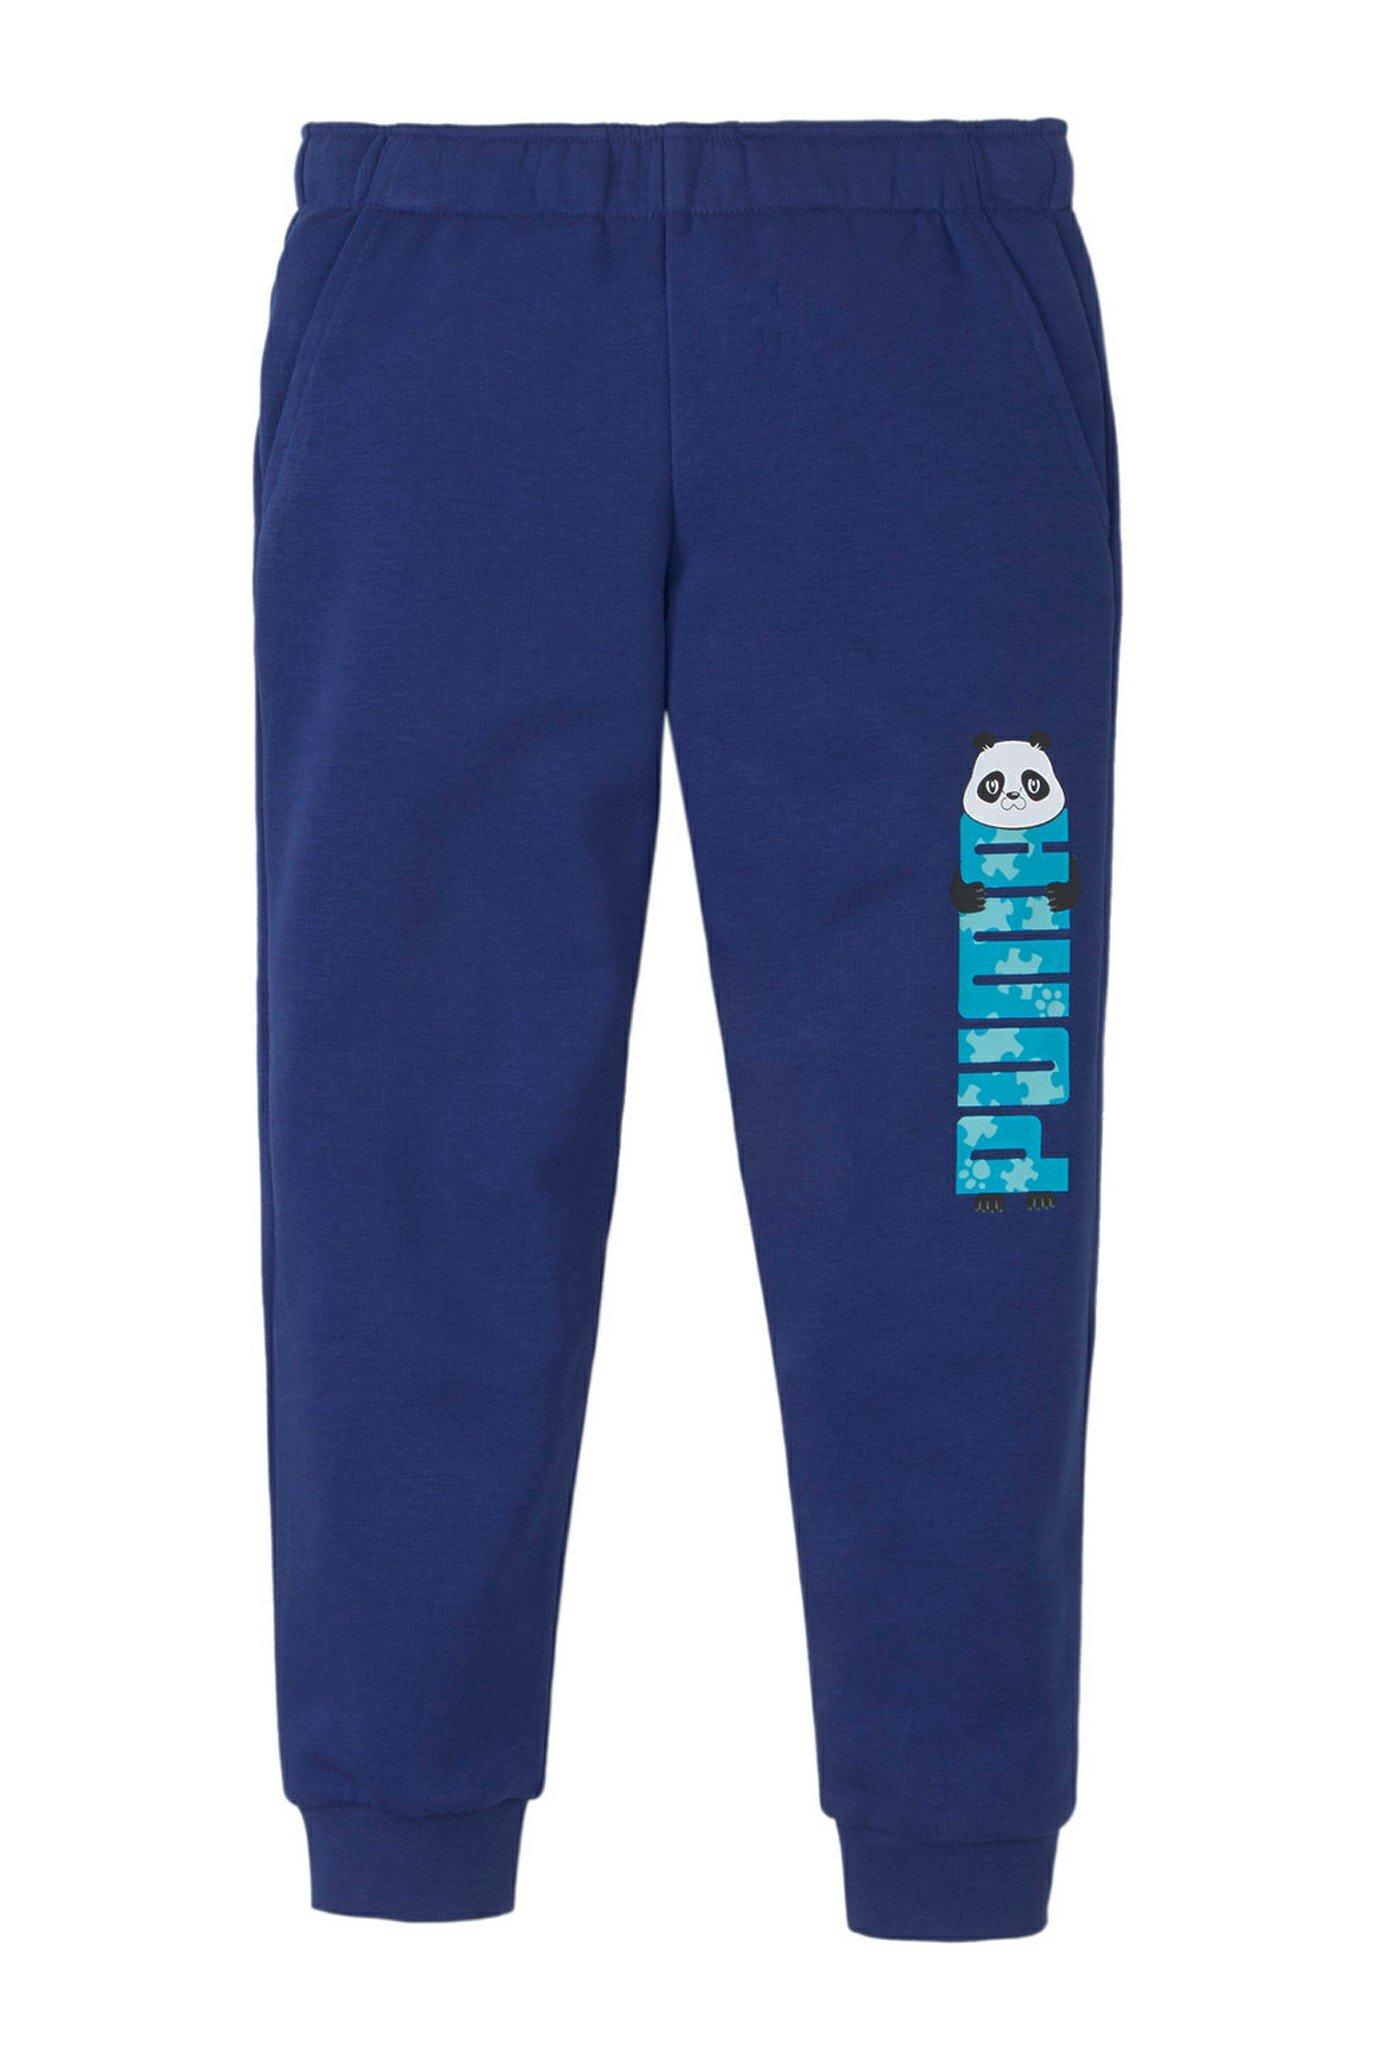 Детские штаны Paw Kids' Sweatpants 1